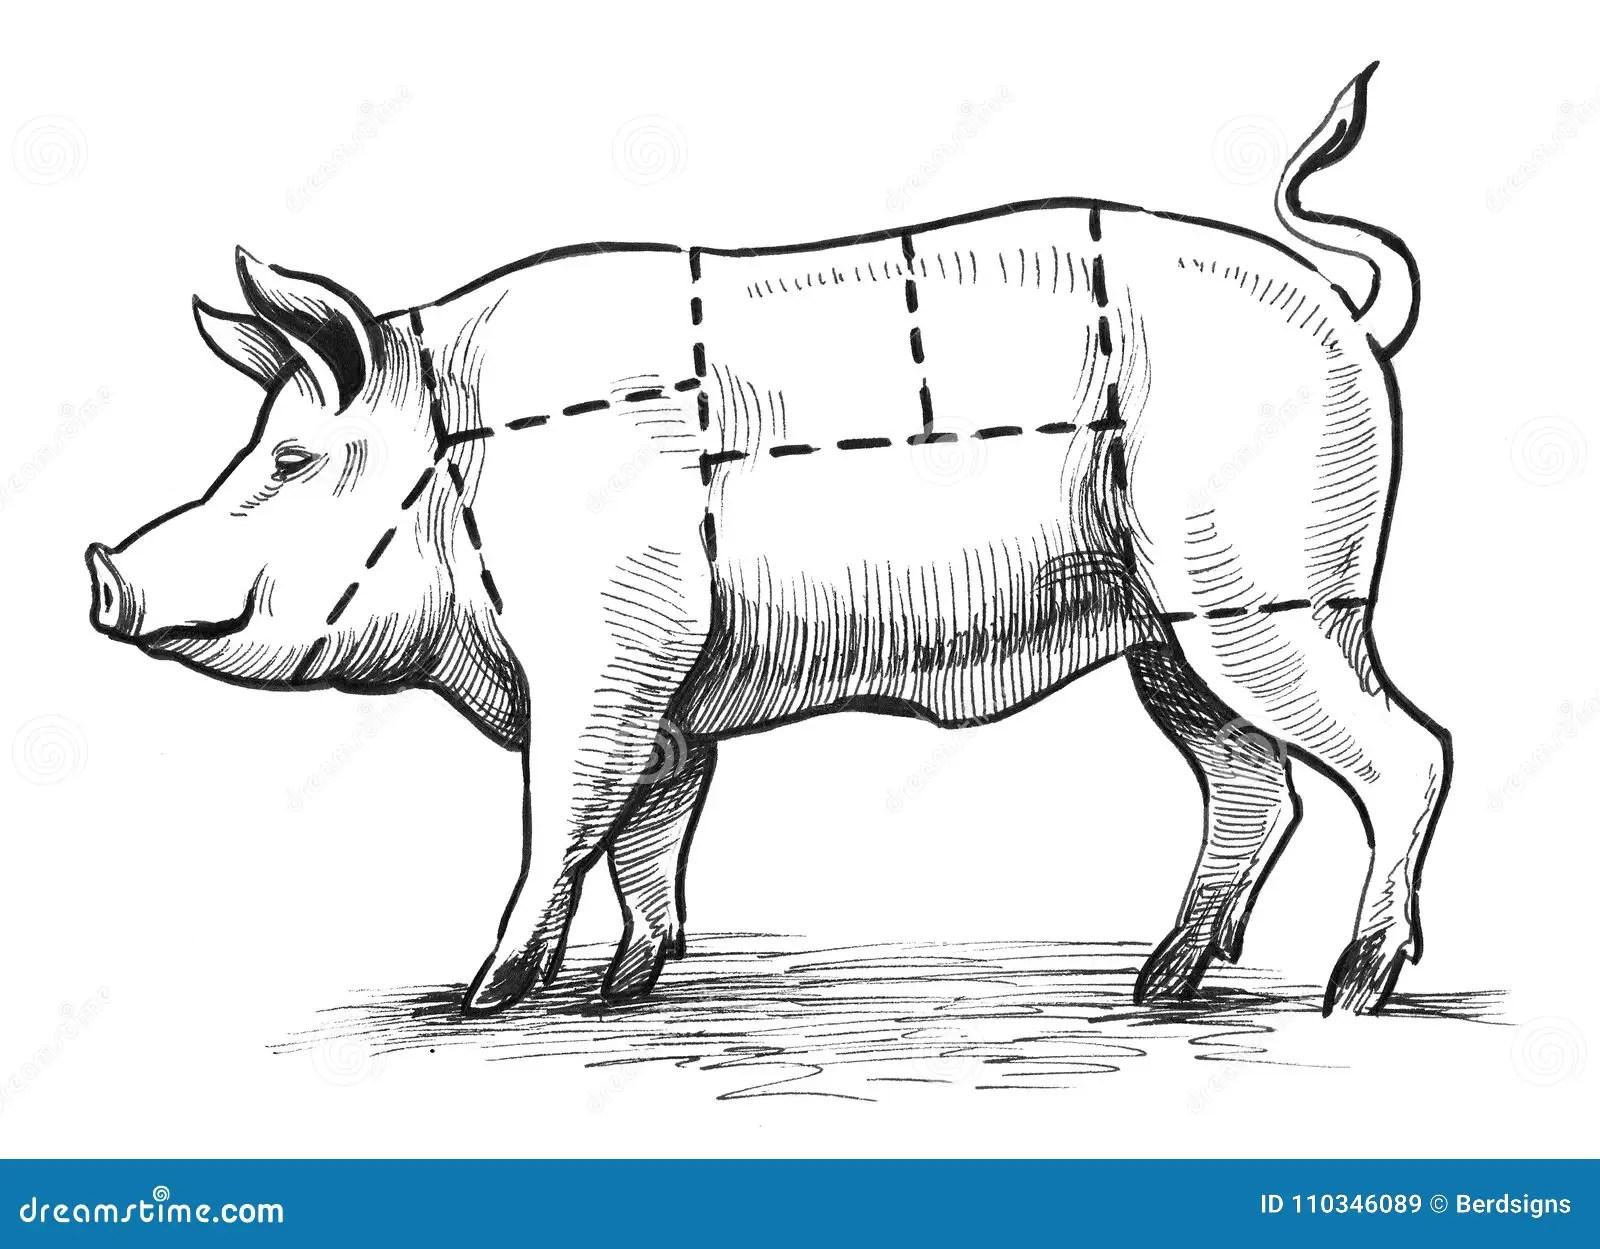 Pig Butcher Chart Stock Illustrations 345 Pig Butcher